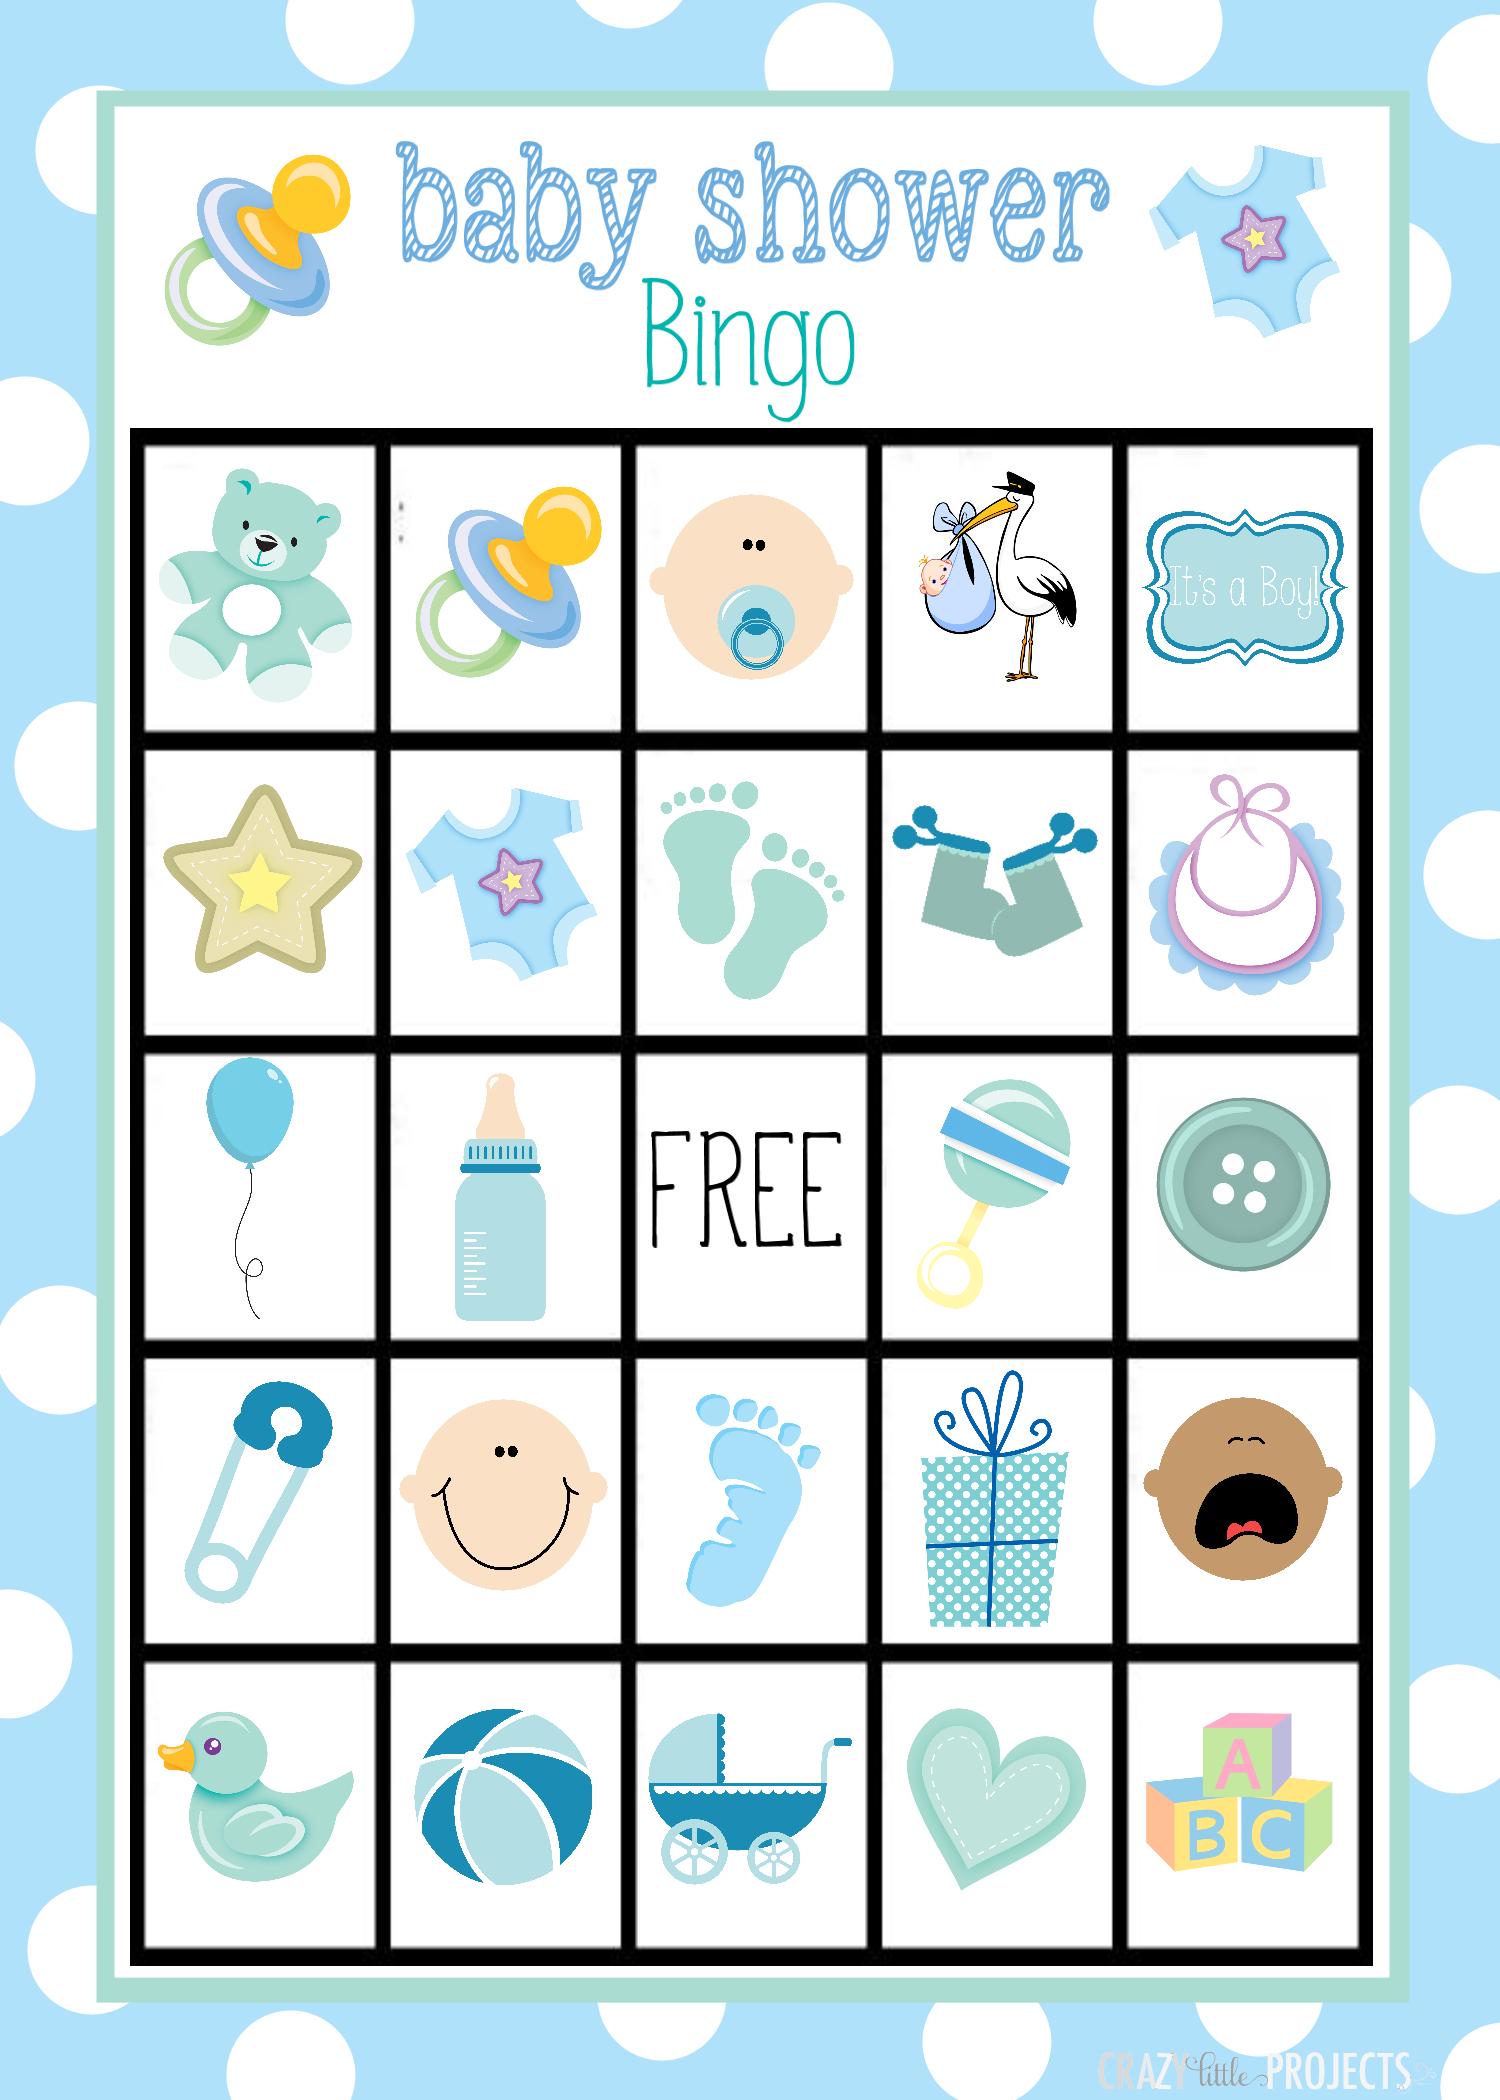 Baby Shower Bingo Cards - Free Printable Baby Shower Bingo